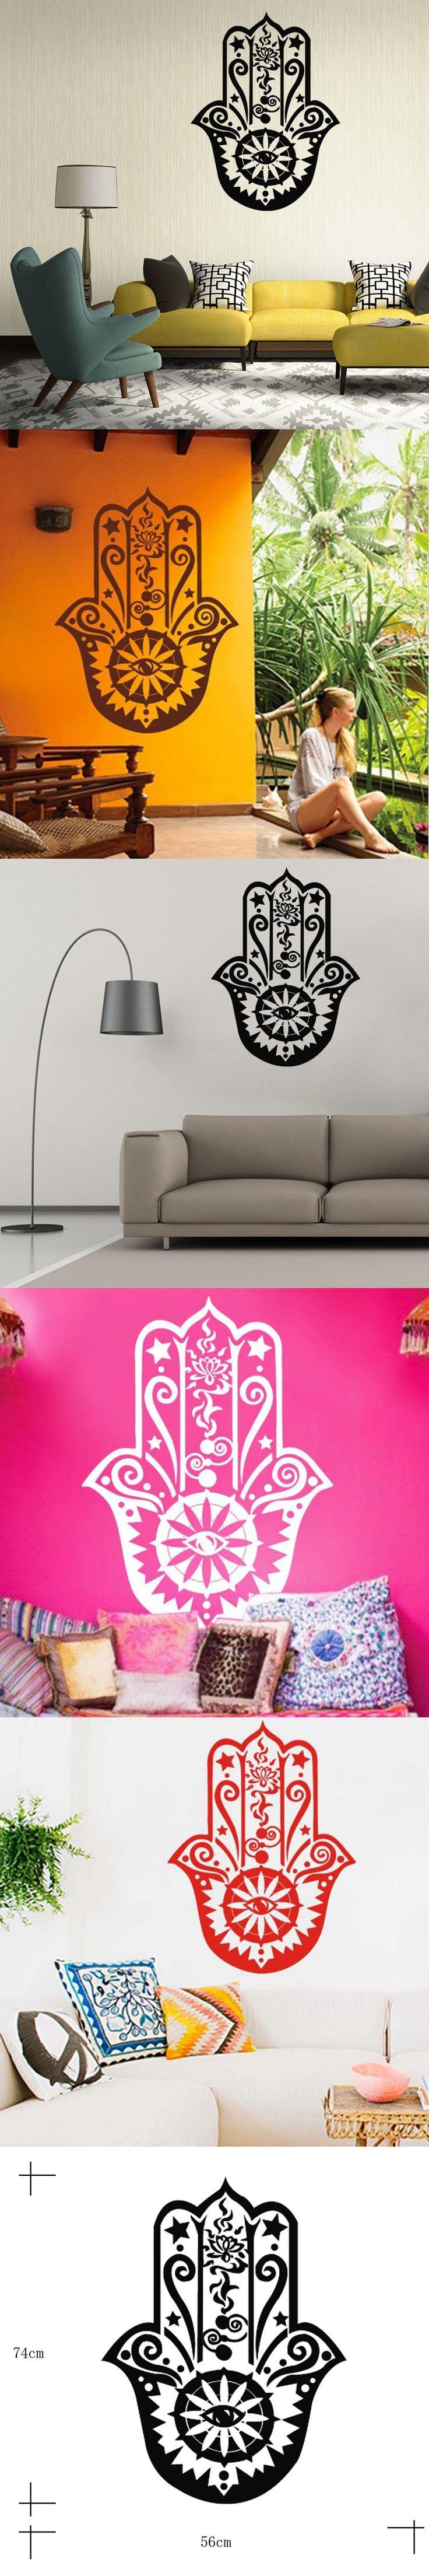 928 best art mural inspiration images on pinterest babies funlife art design hamsa hand wall decal vinyl fatima yoga vibes sticker fish eye decals indian buddha home decor lotus mural